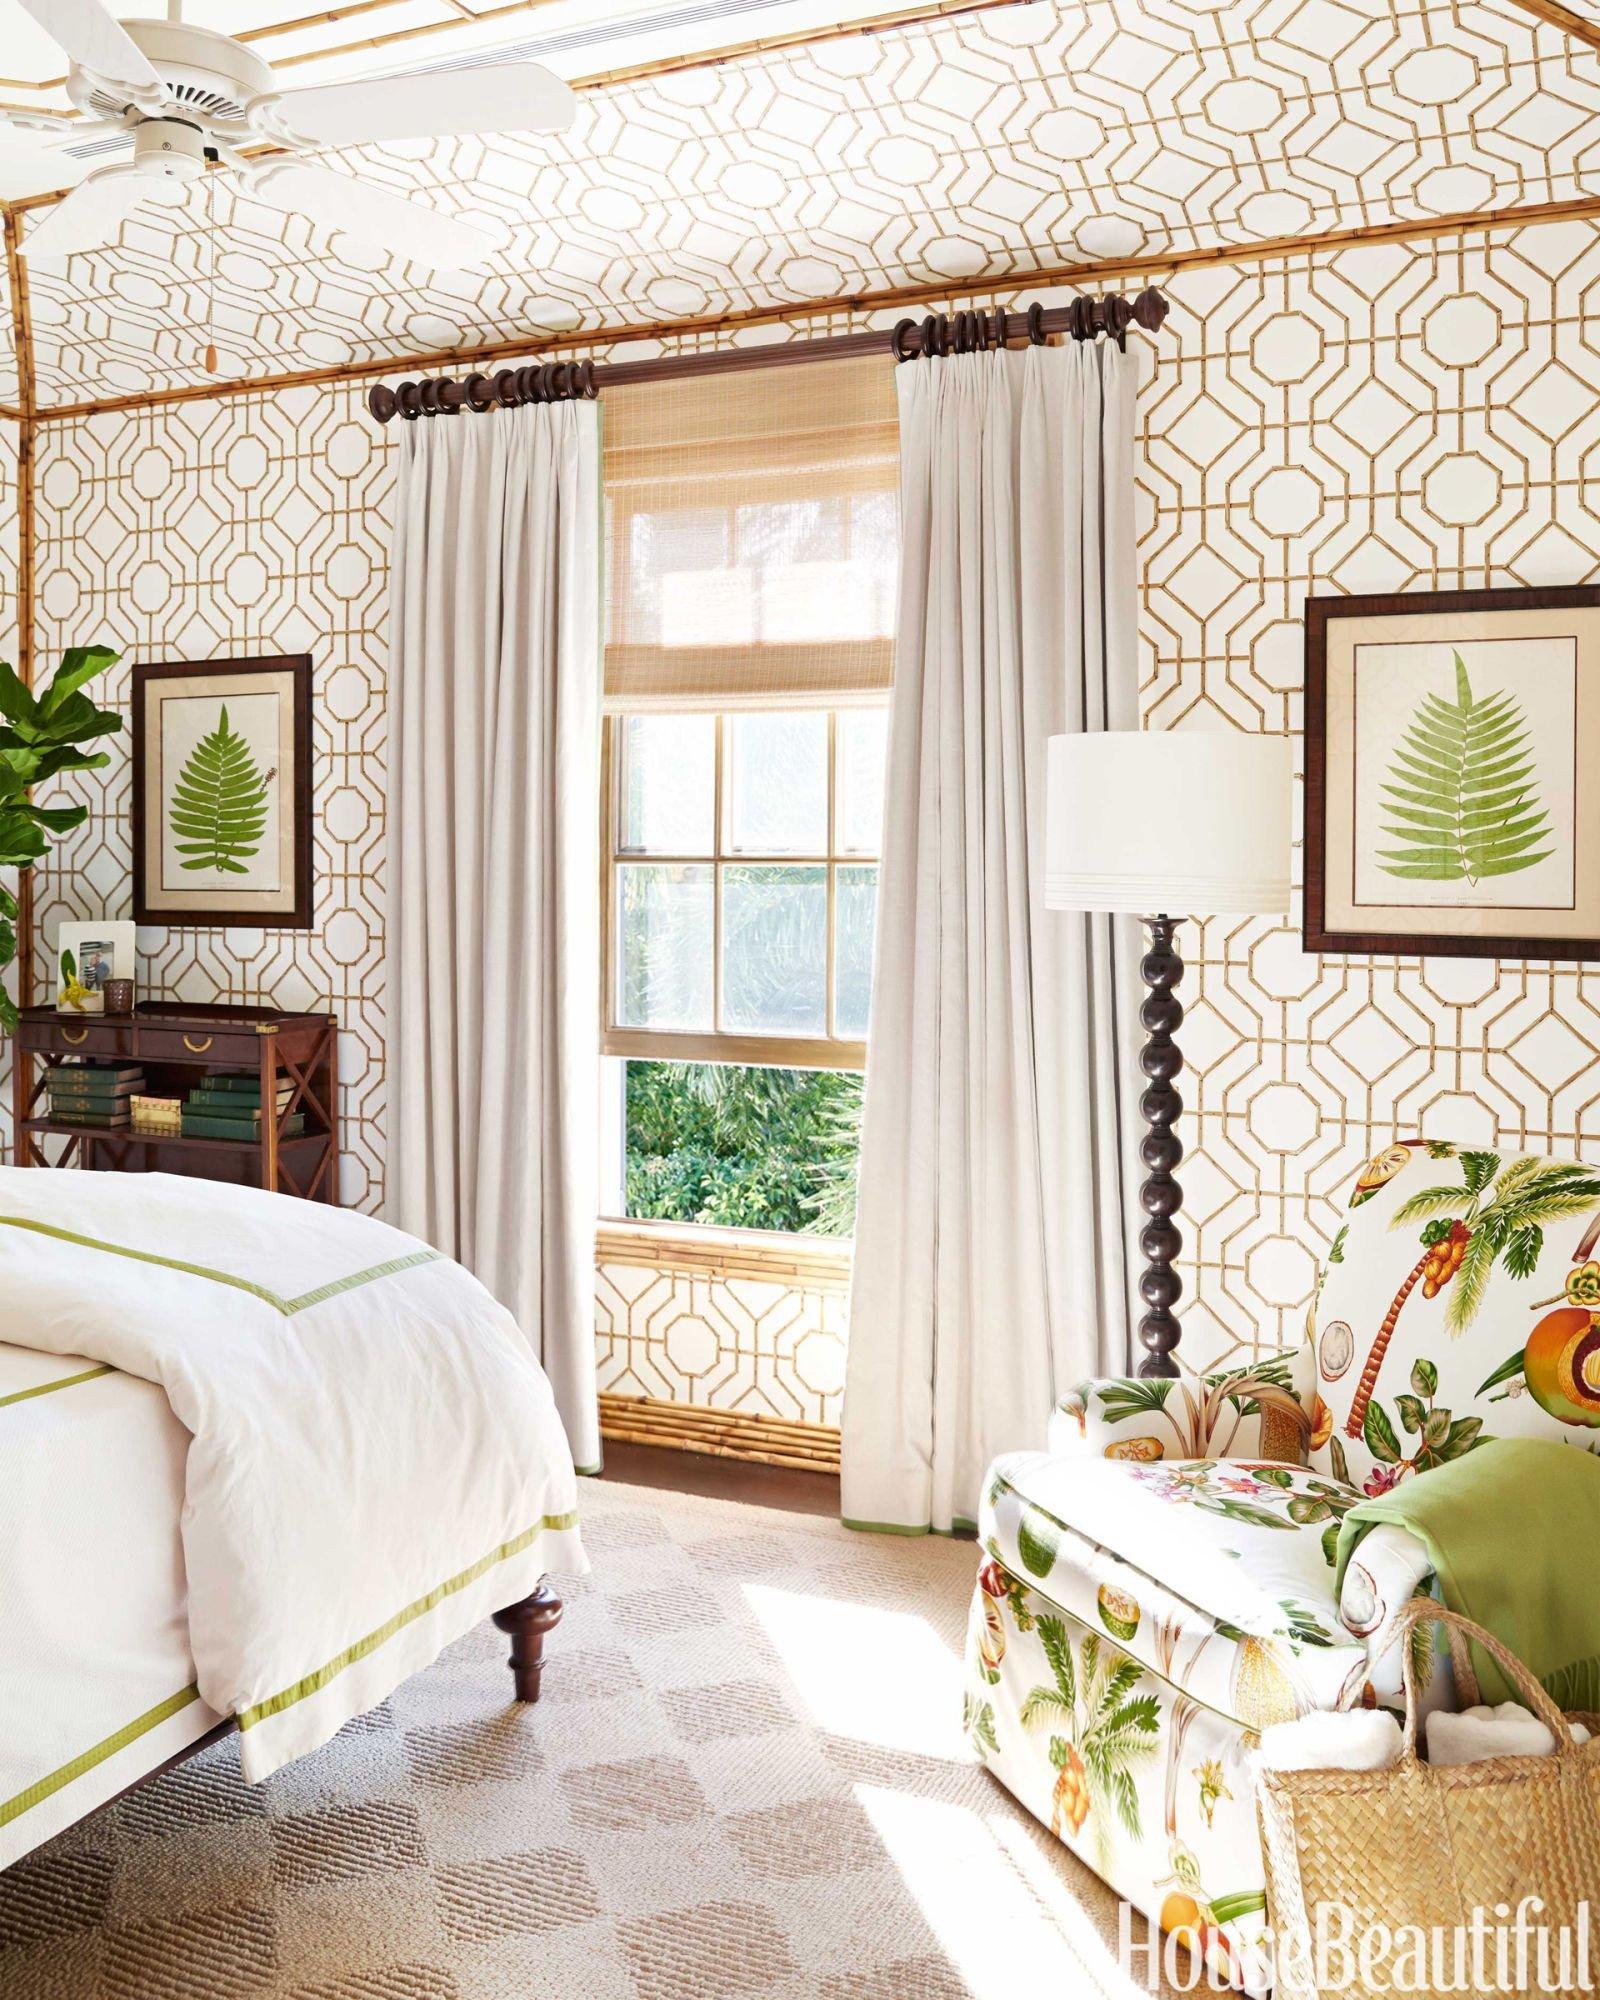 Floor Decor West Palm Beach Elegant A Colorful and Whimsical Palm Beach House Sleeping Beauty